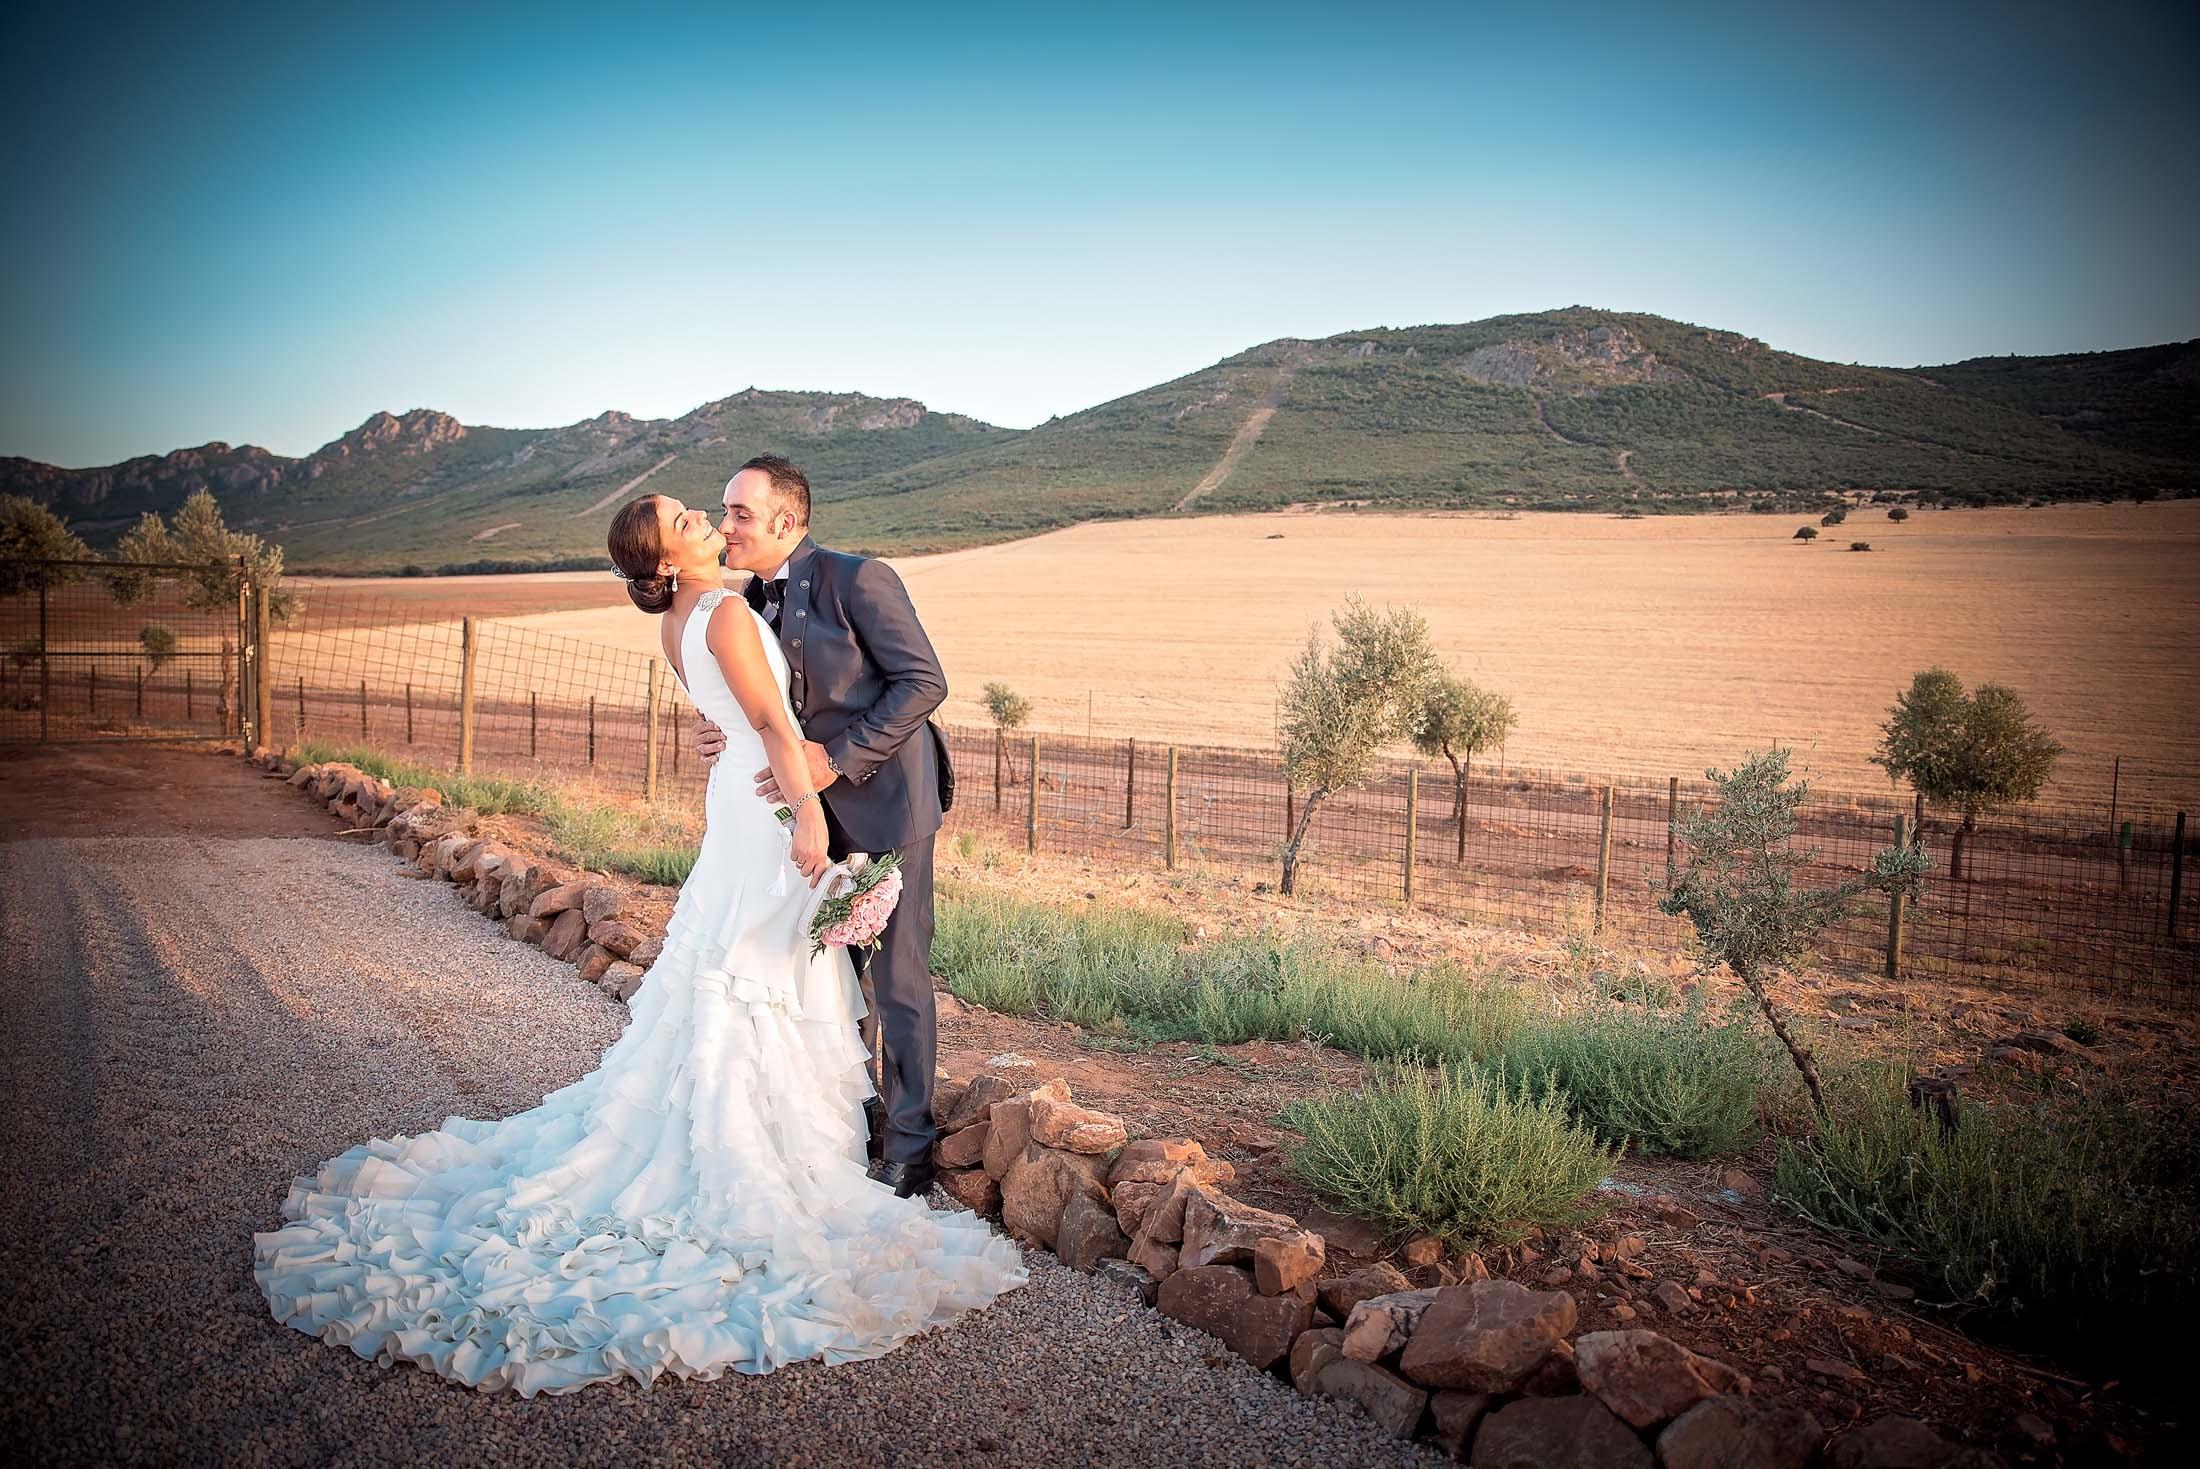 Fotografo de bodas Puertollano